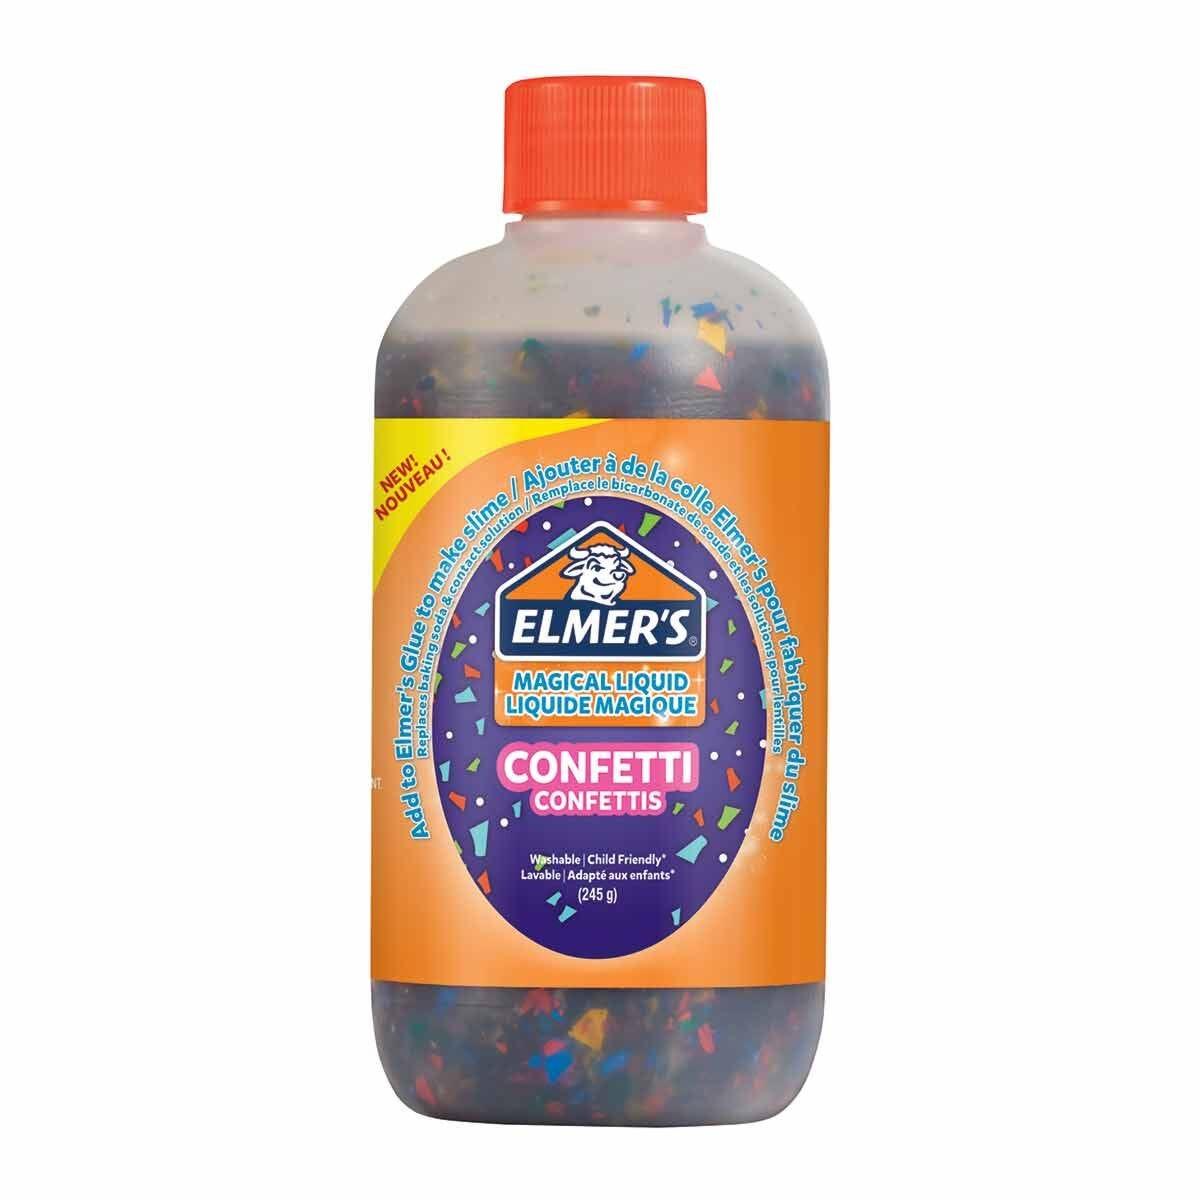 Elmers Magical Liquid Confetti 245g